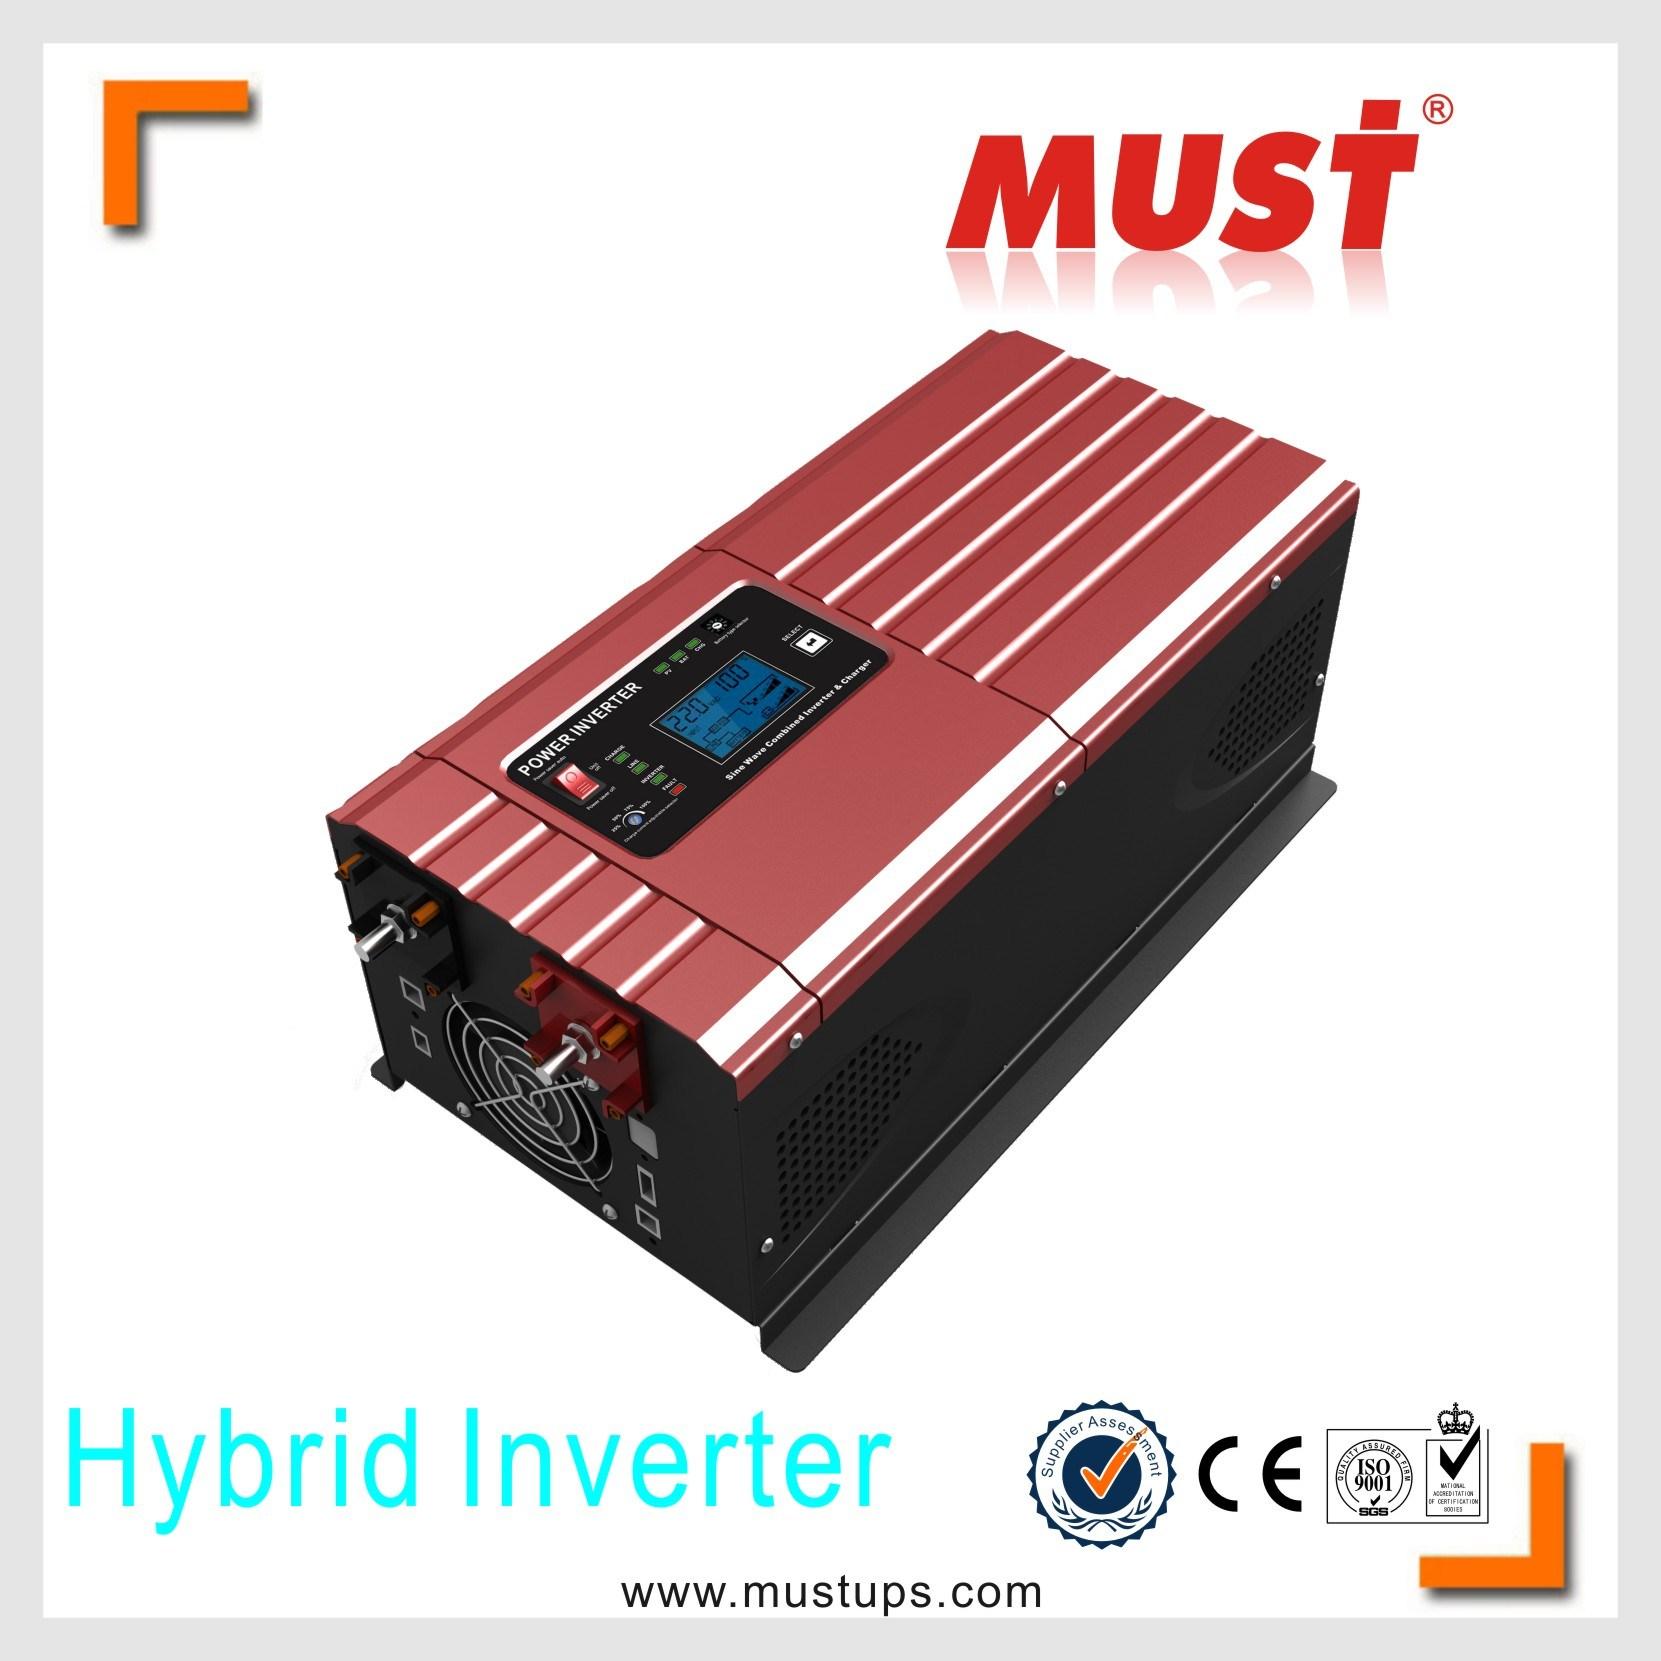 China Low Frequency 3000w 24v 48v Off Grid Power Inverter Transformerless Supply 24vdc 120v Ac And 230v Electrical Solar